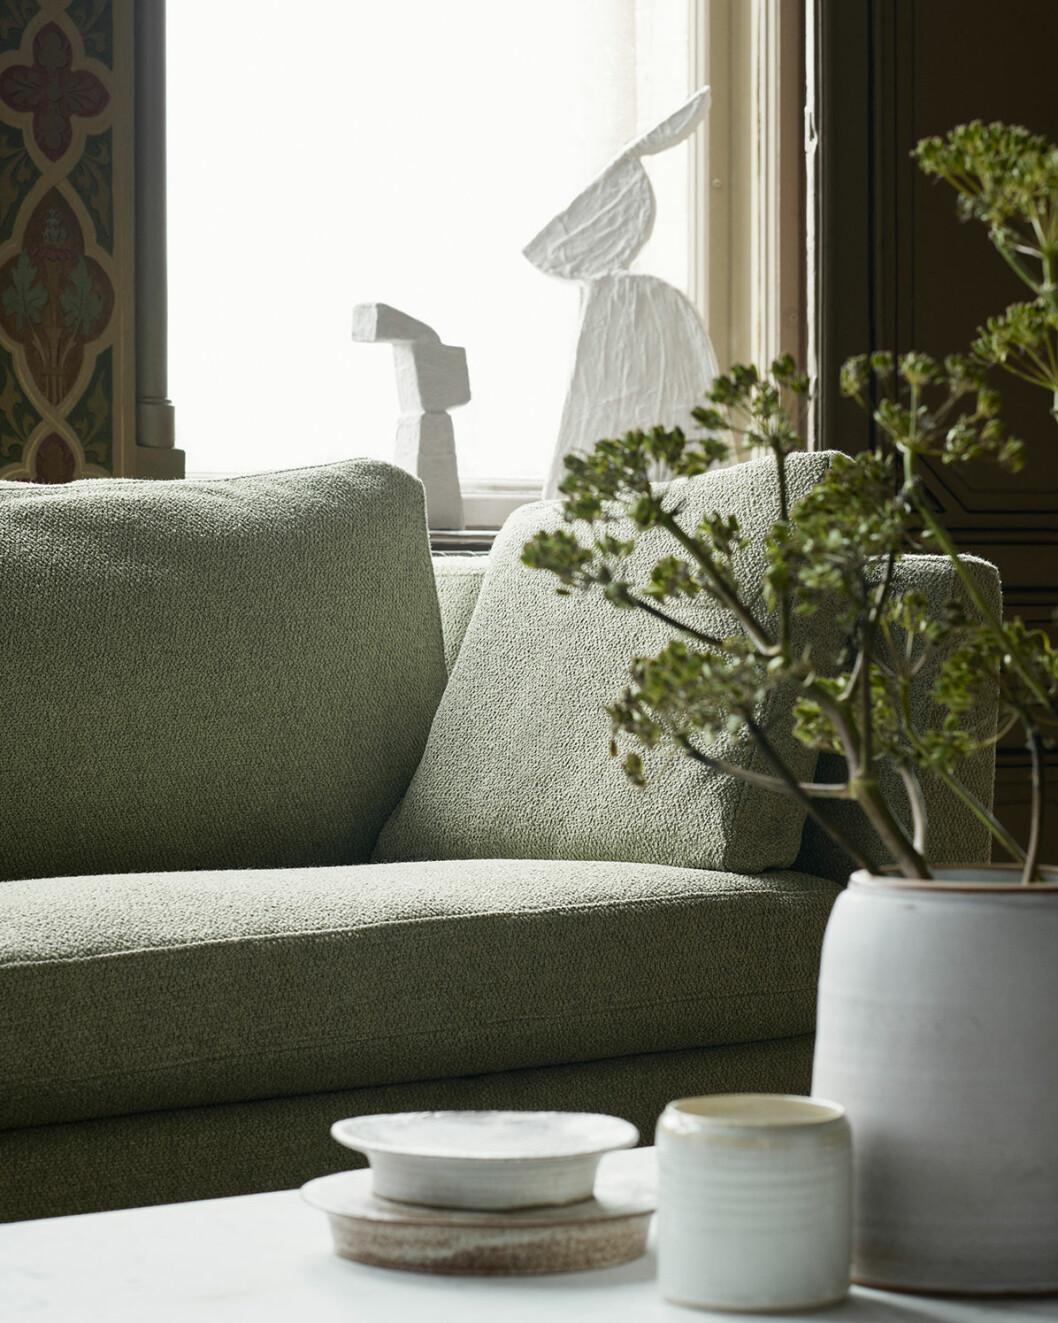 Klä om IKE-soffan i Bemz taktila tyger.